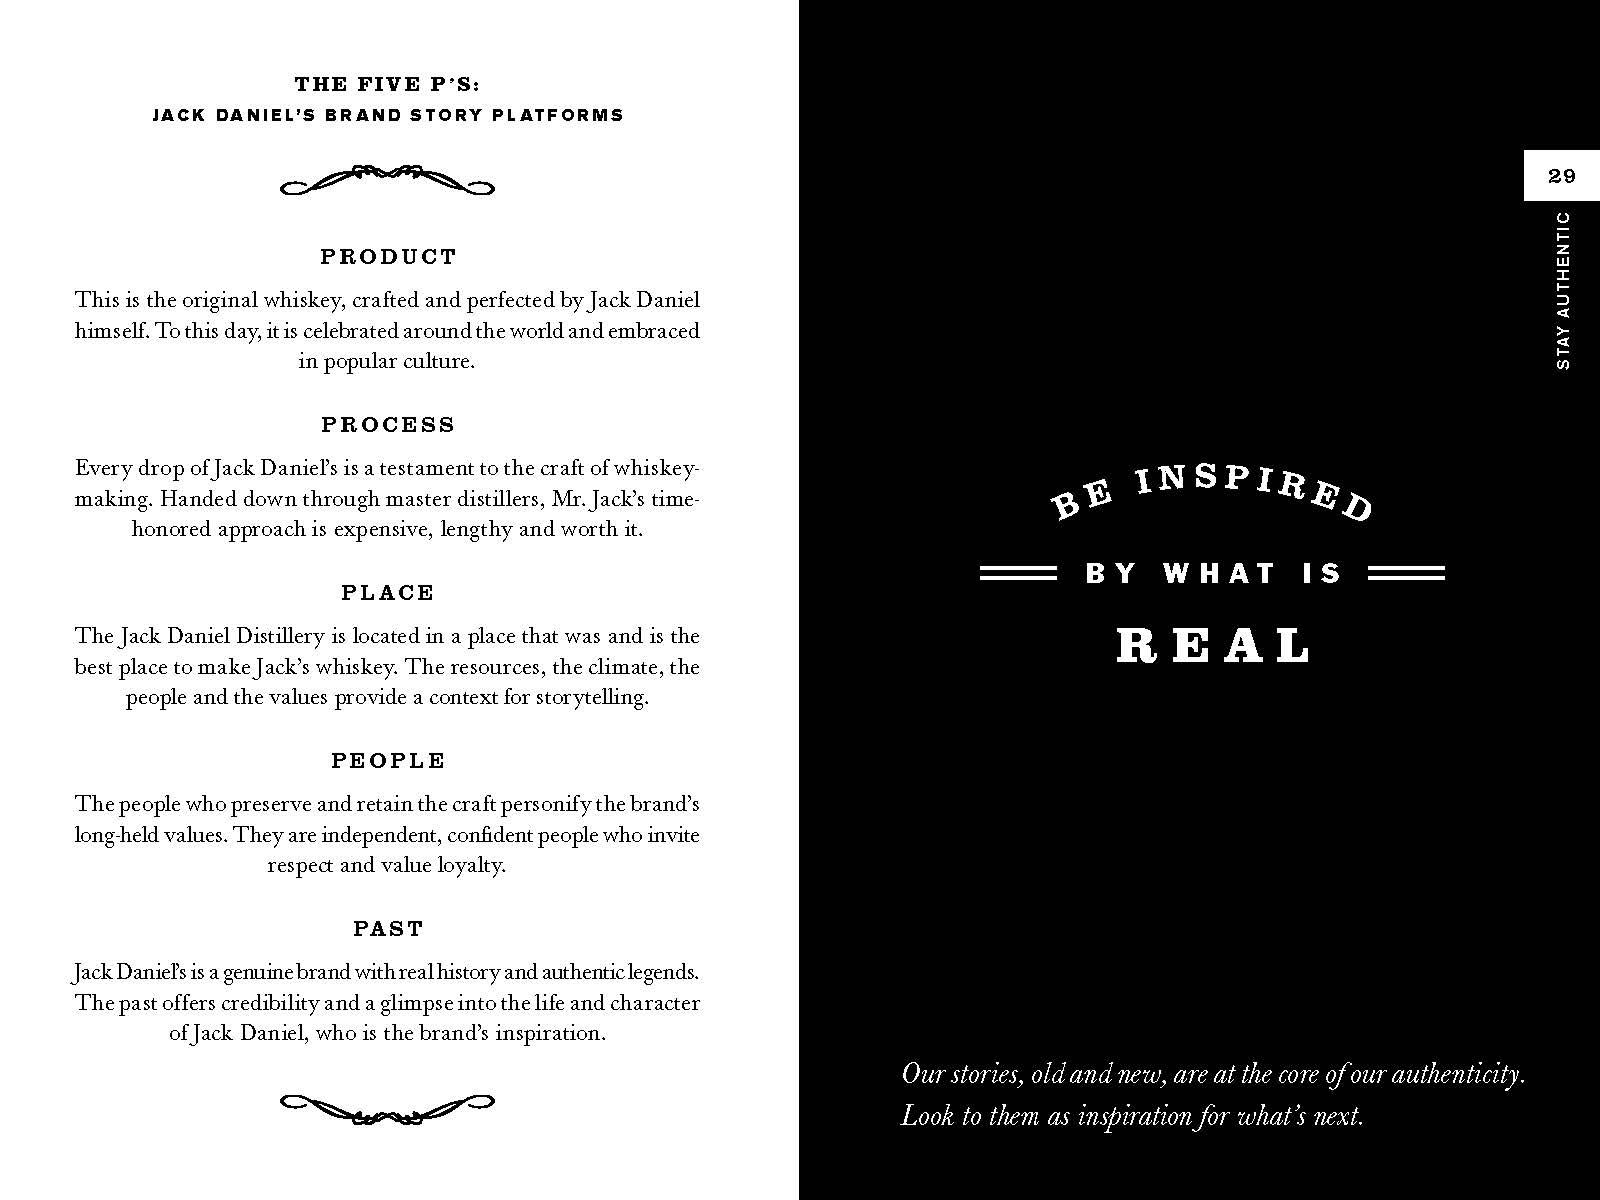 Jack Daniel's Guiding Principles 2012_Page_18.jpg